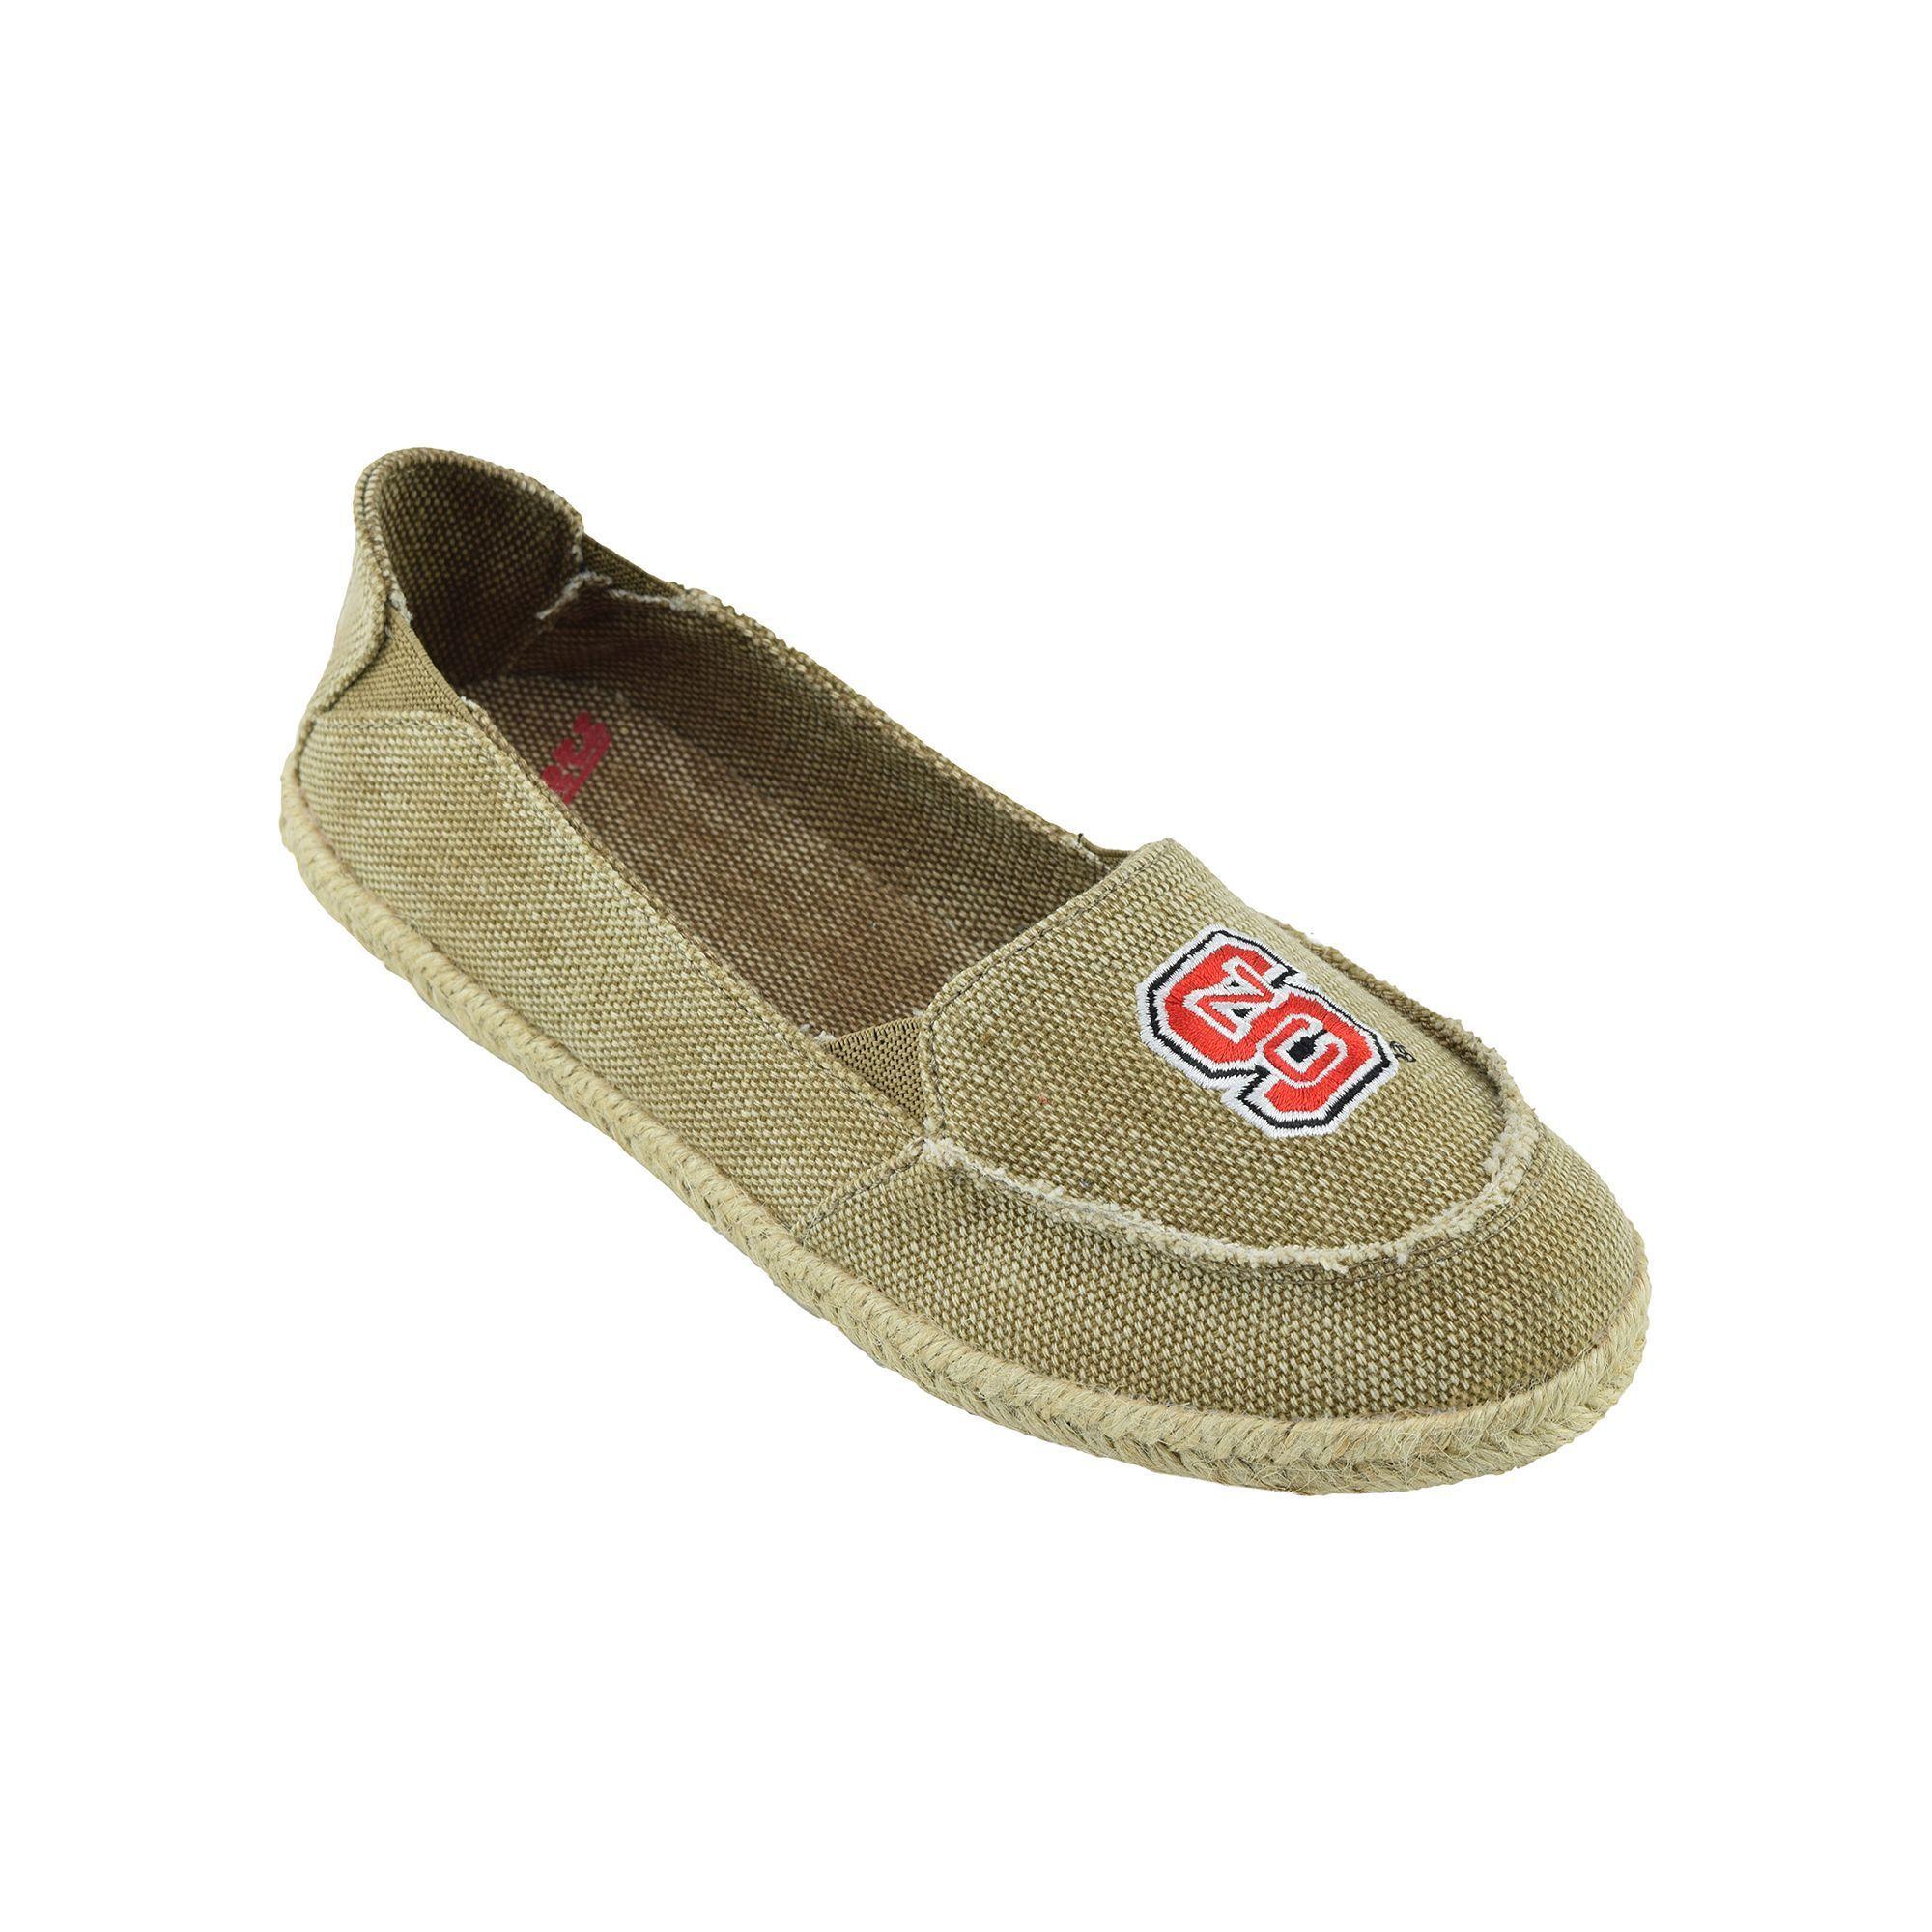 Women's Campus Cruzerz North Carolina State Wolfpack Cabo Slip-On Shoes, Girl's, Size: 6, Beig/Green (Beig/Khaki)